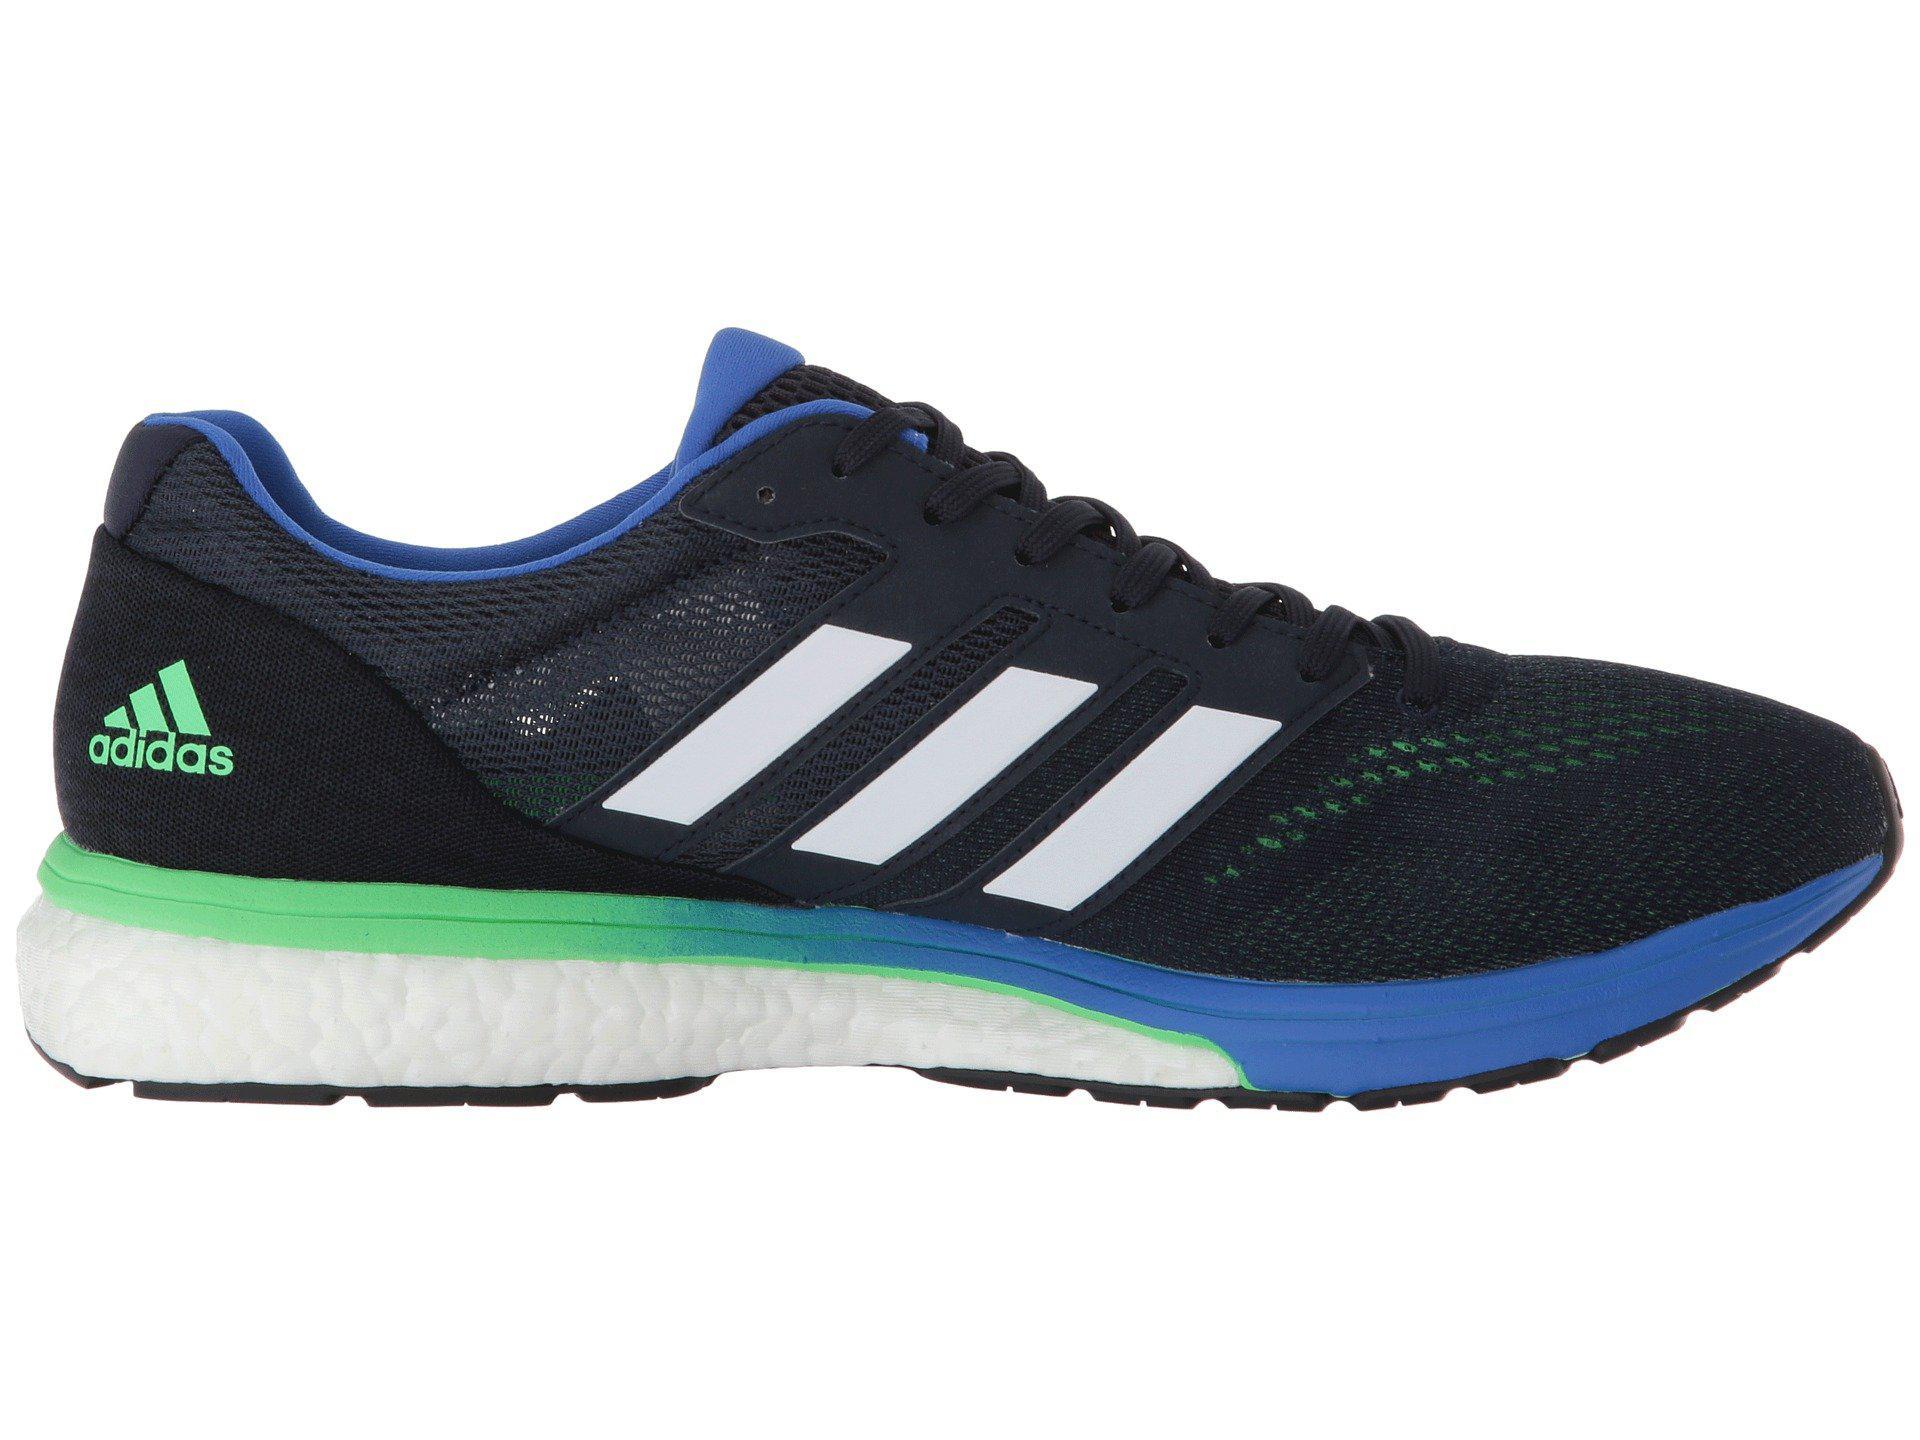 Adidas Men's Running Adizero Boston 7 Shoes Blue   Adidas